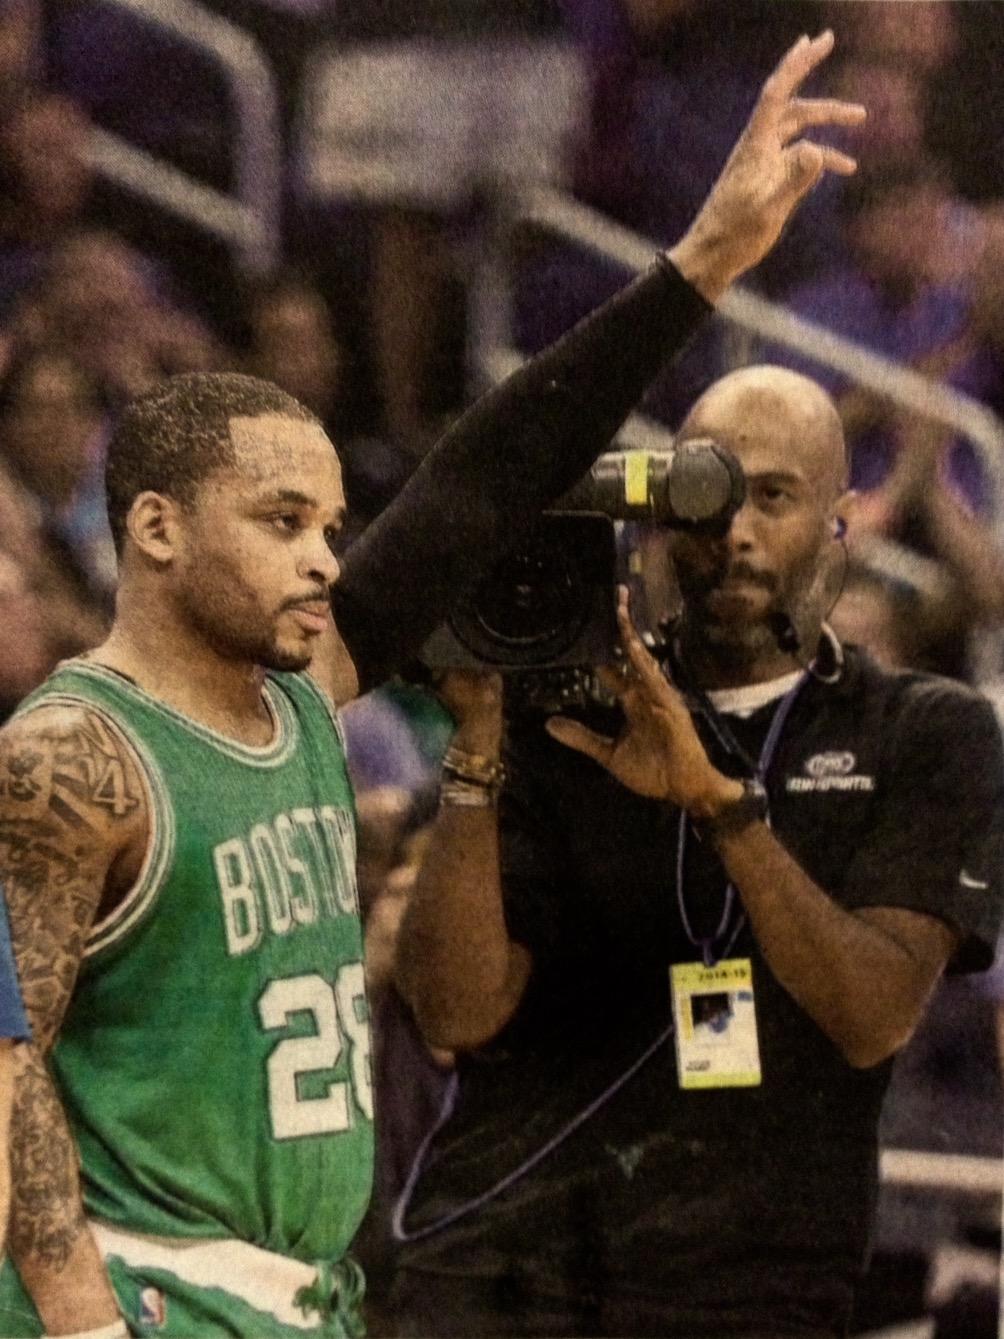 Clem Harrod, Sports Videographer  (right)  filming Jameer Nelson, Boston Celtics Point Guard  (left)